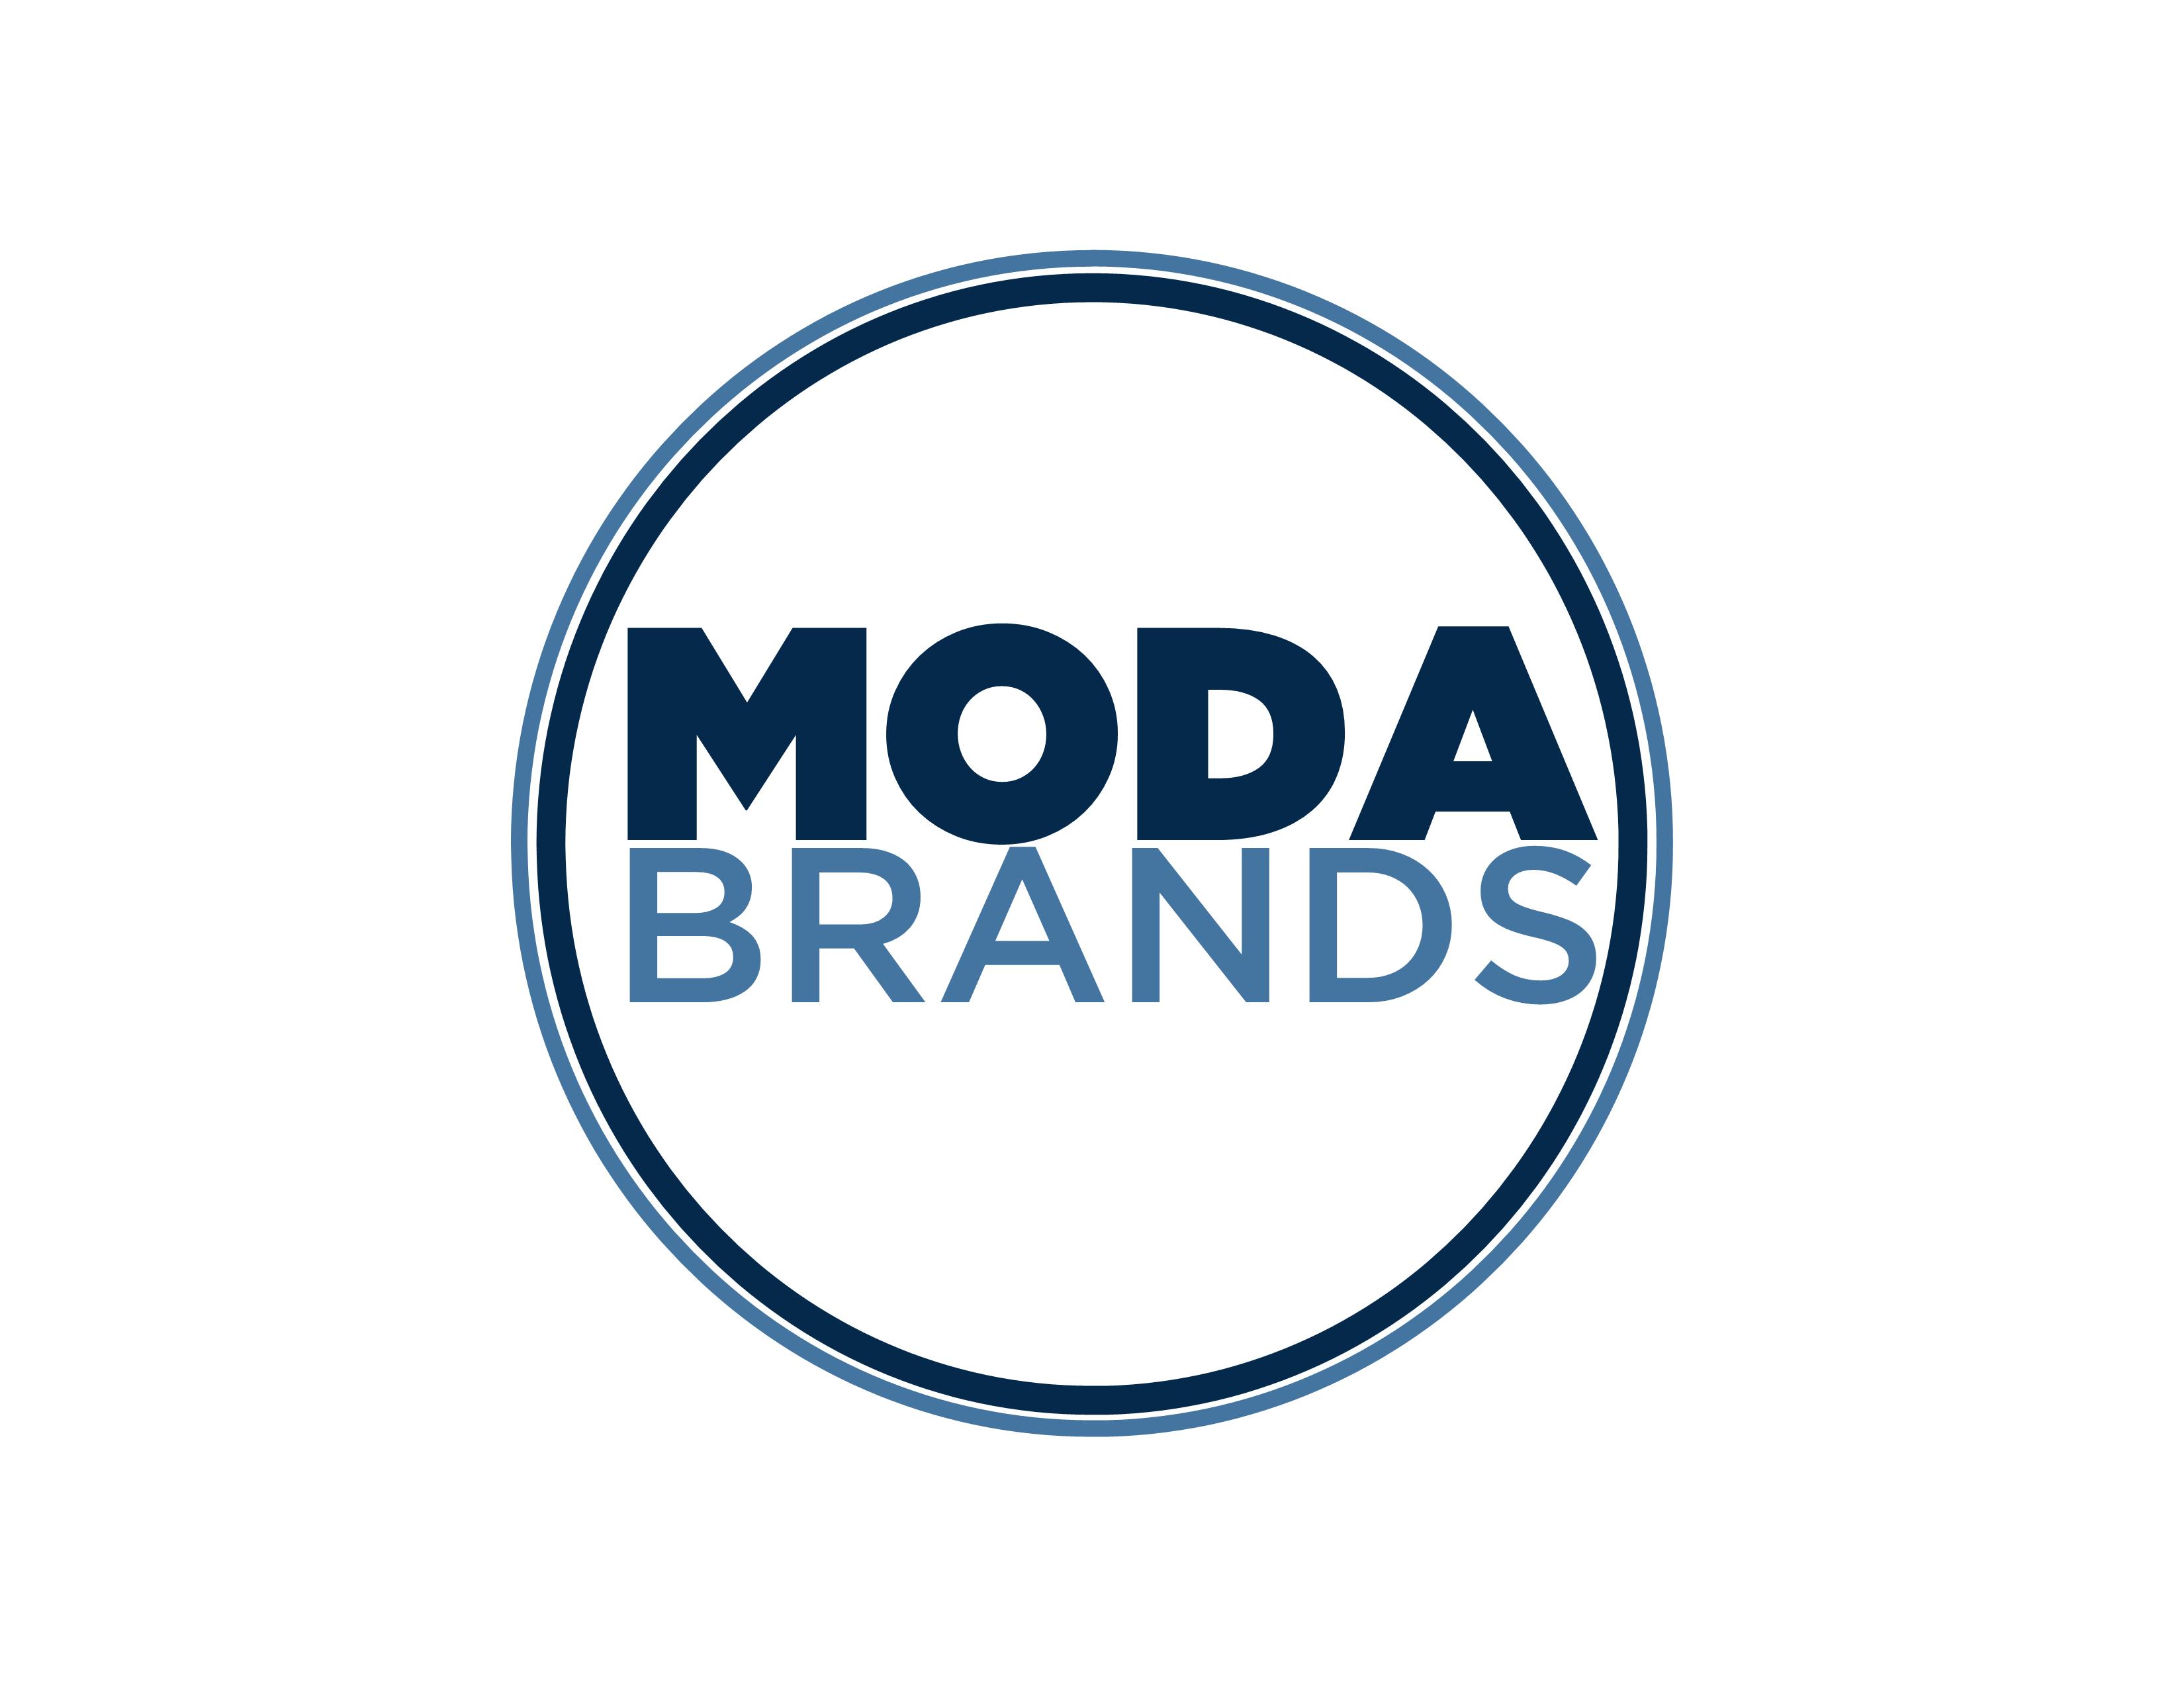 Moda Brands